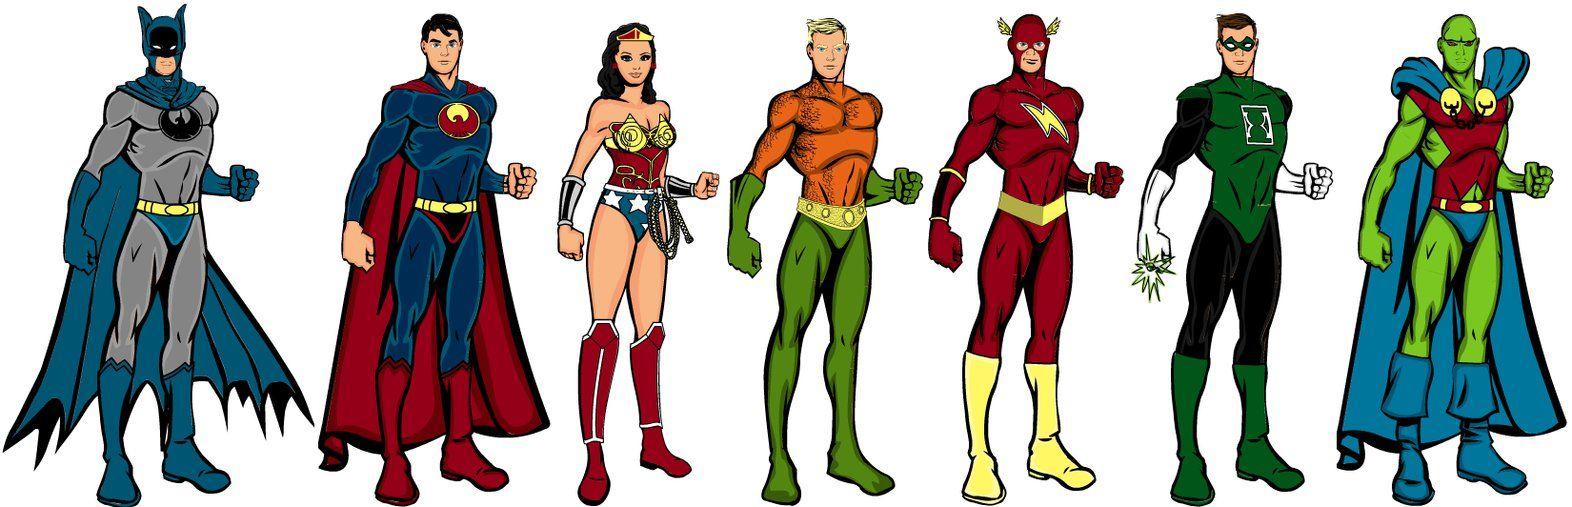 Justice League Founders Comic Justice League Comics Dc Heroes